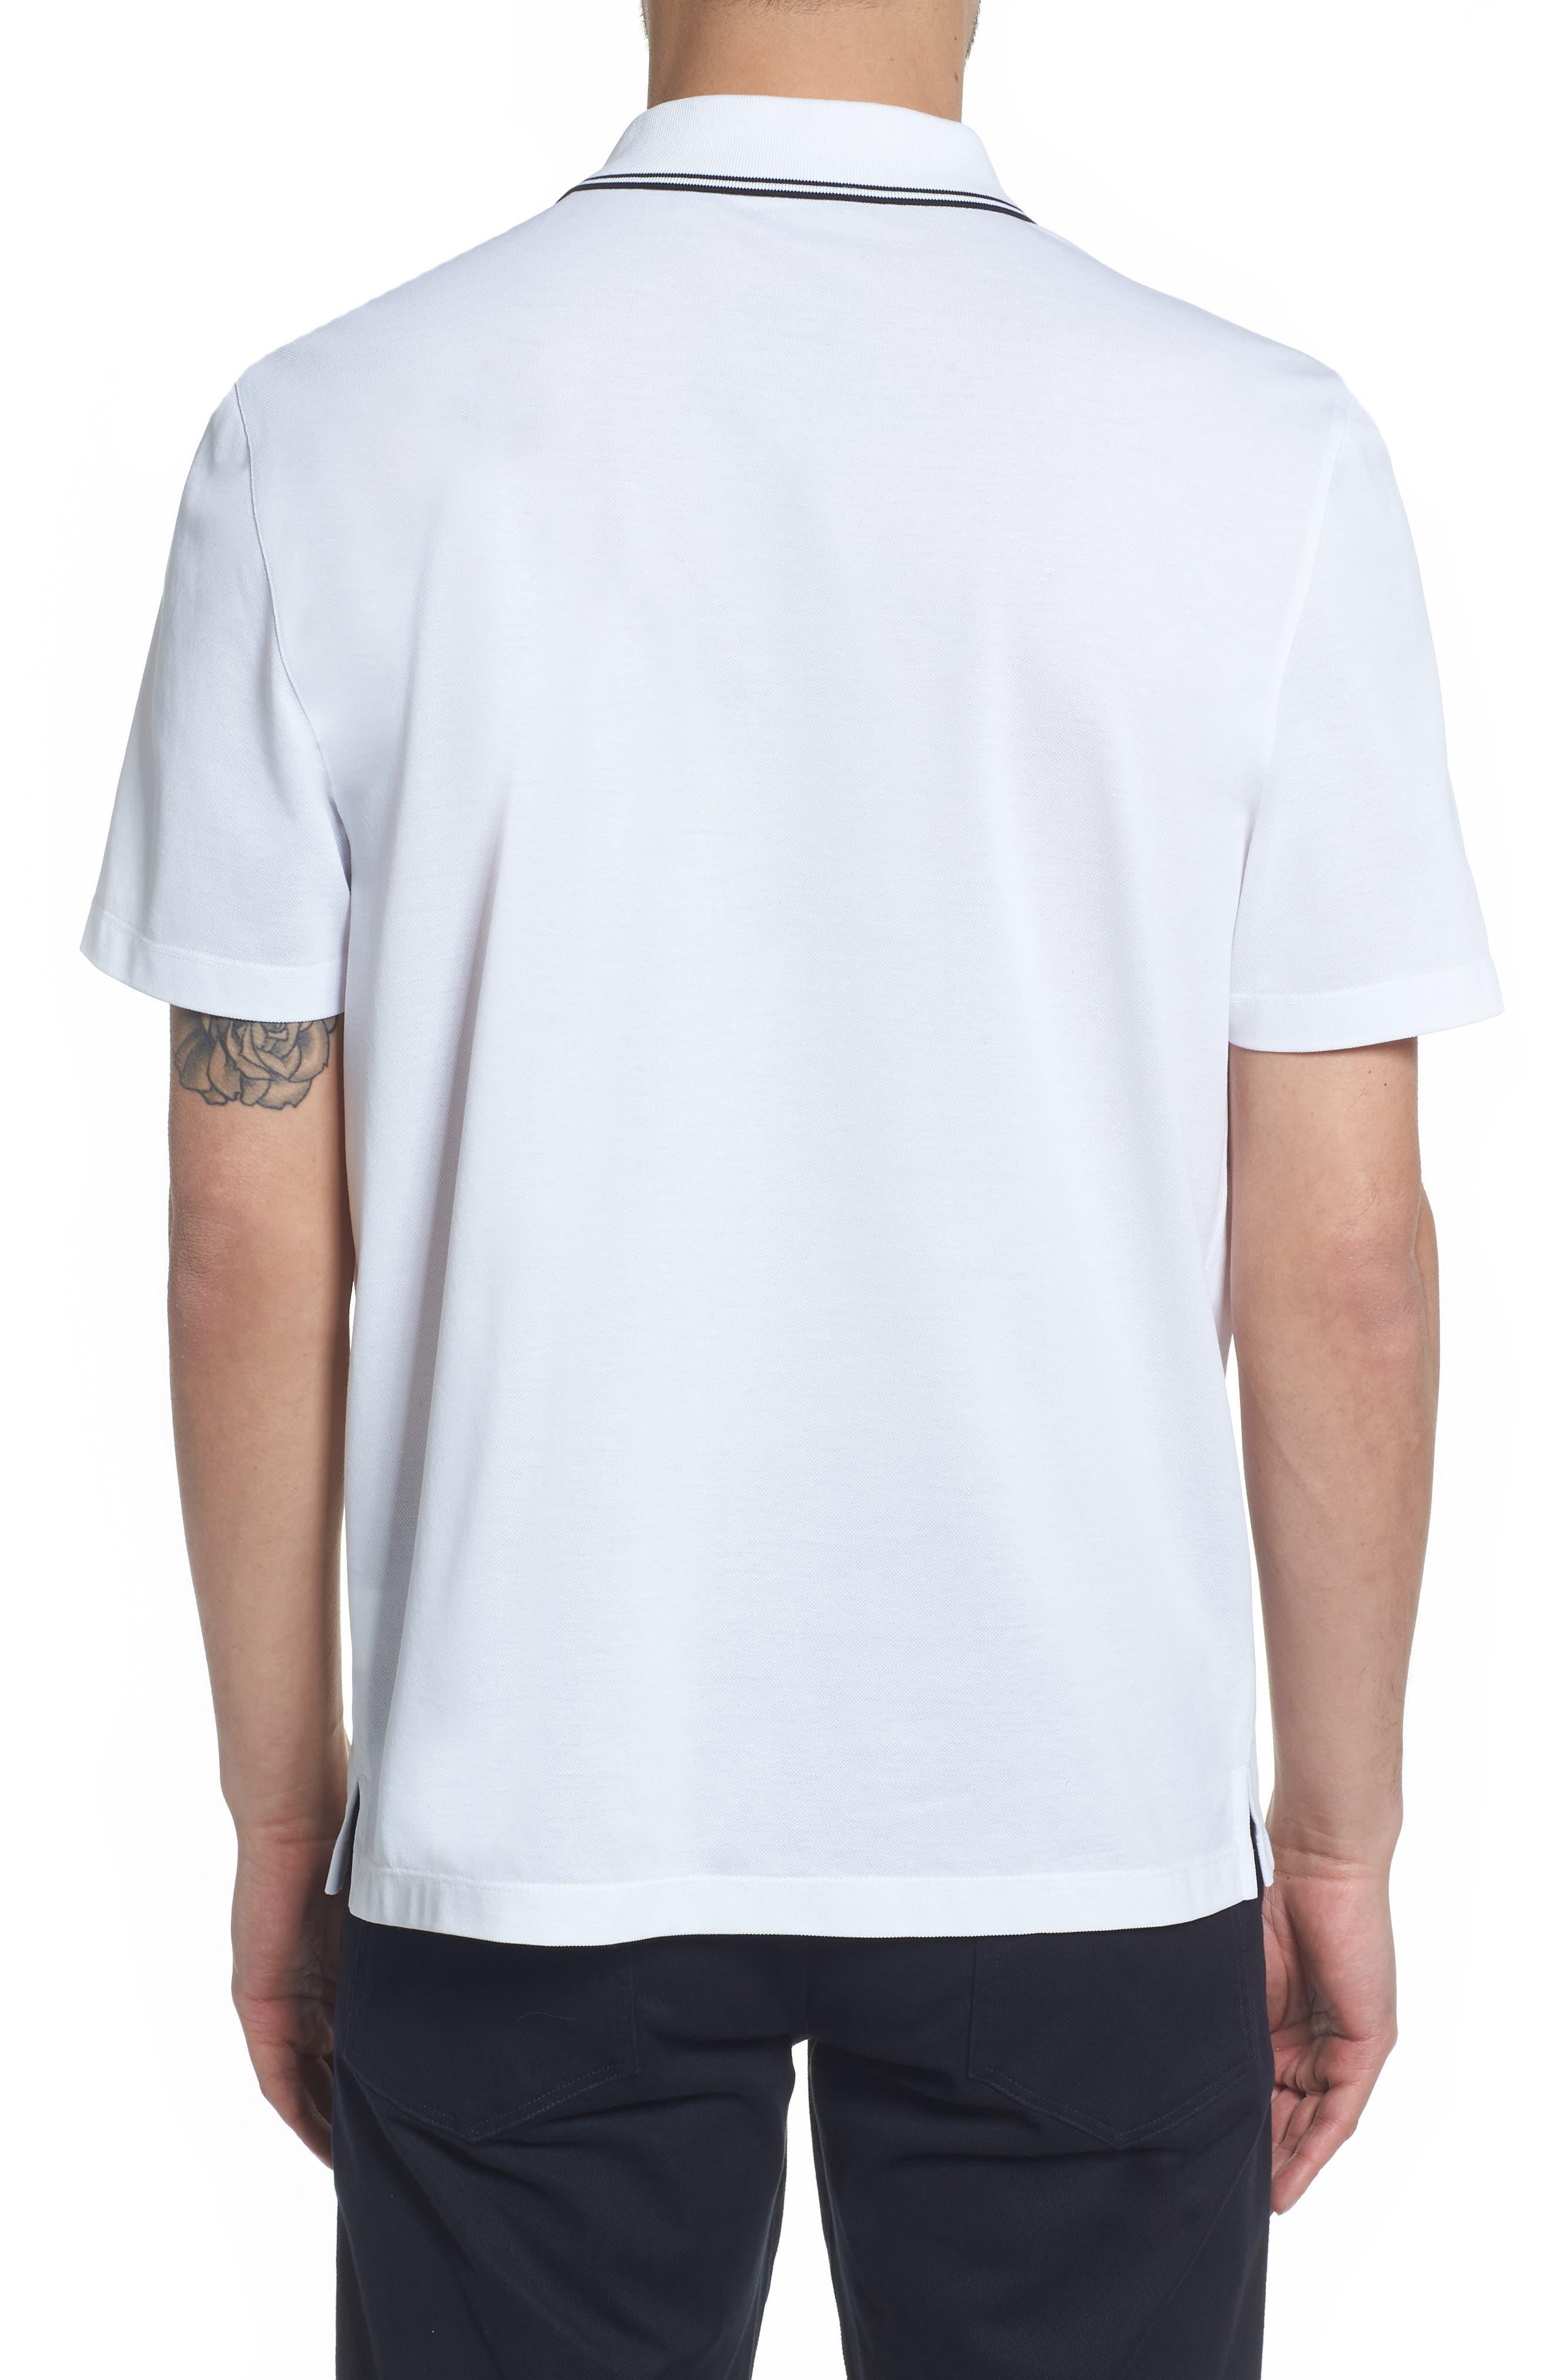 Regular Fit Polo,                             Alternate thumbnail 2, color,                             OPTIC WHITE